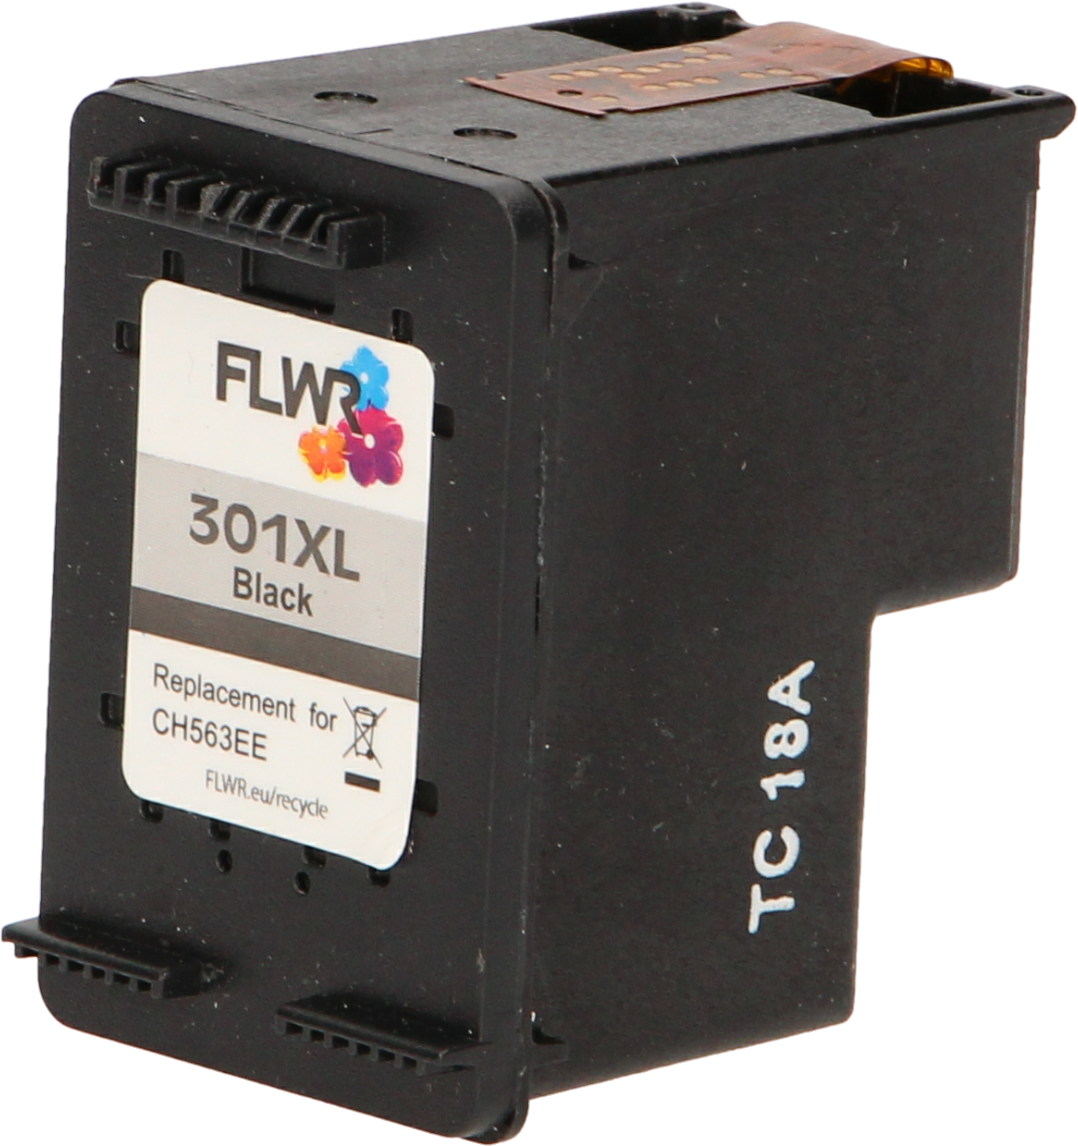 FLWR HP 301XL zwart